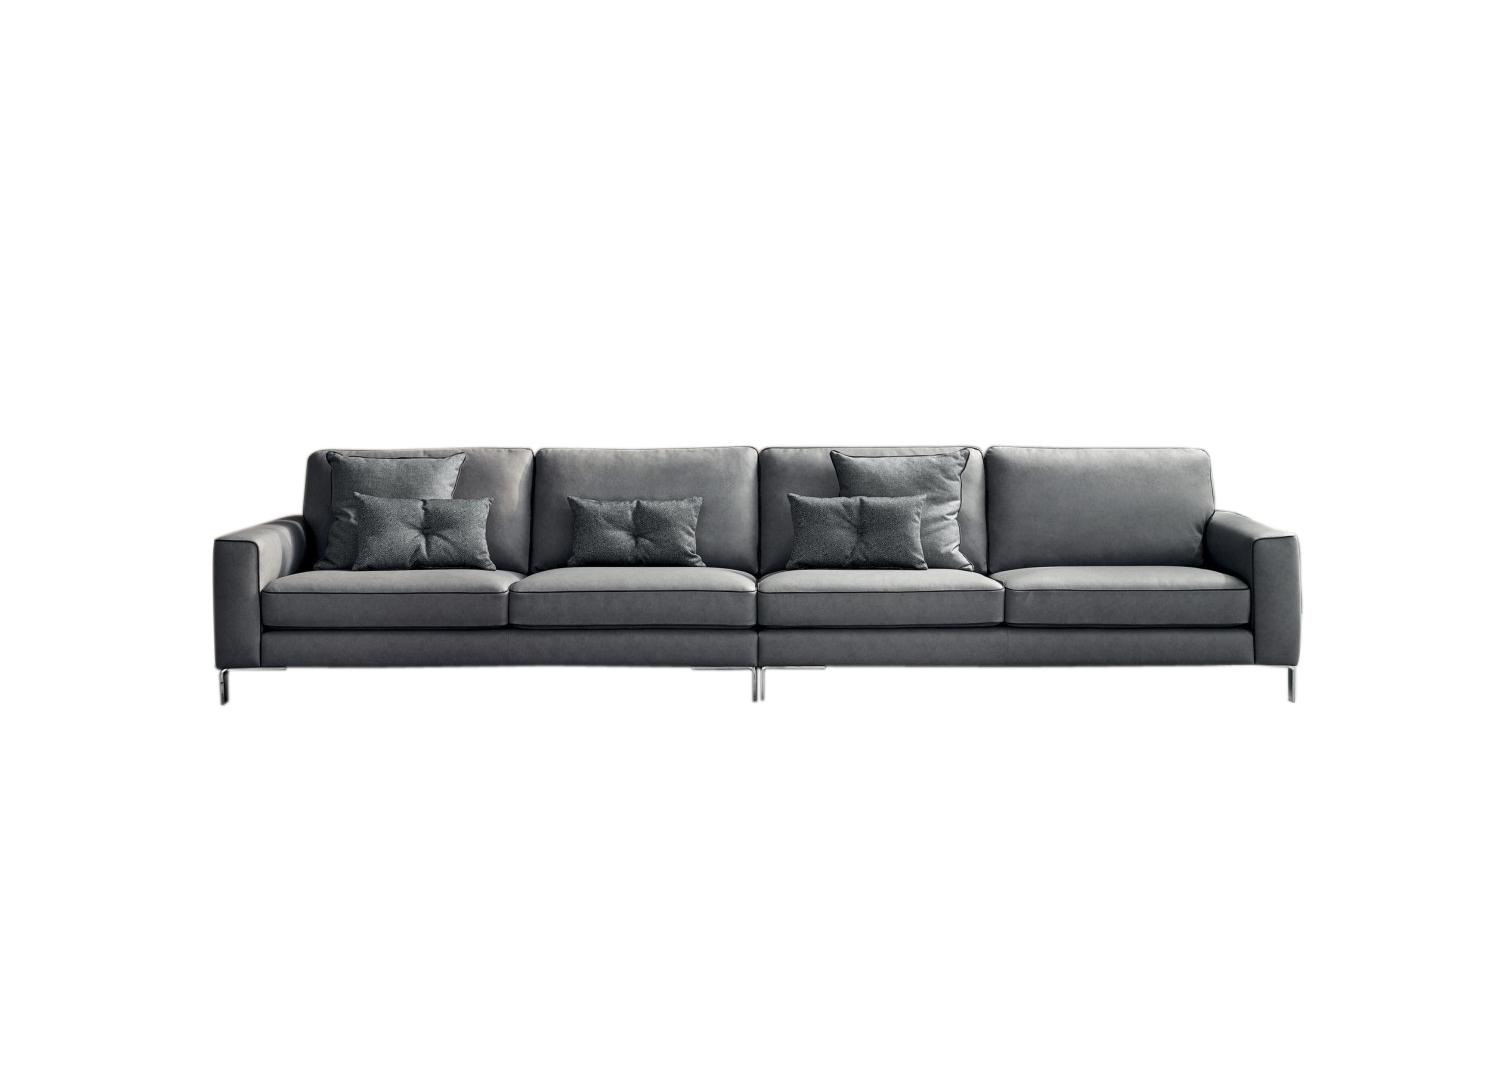 Canapea din piele Russel Double